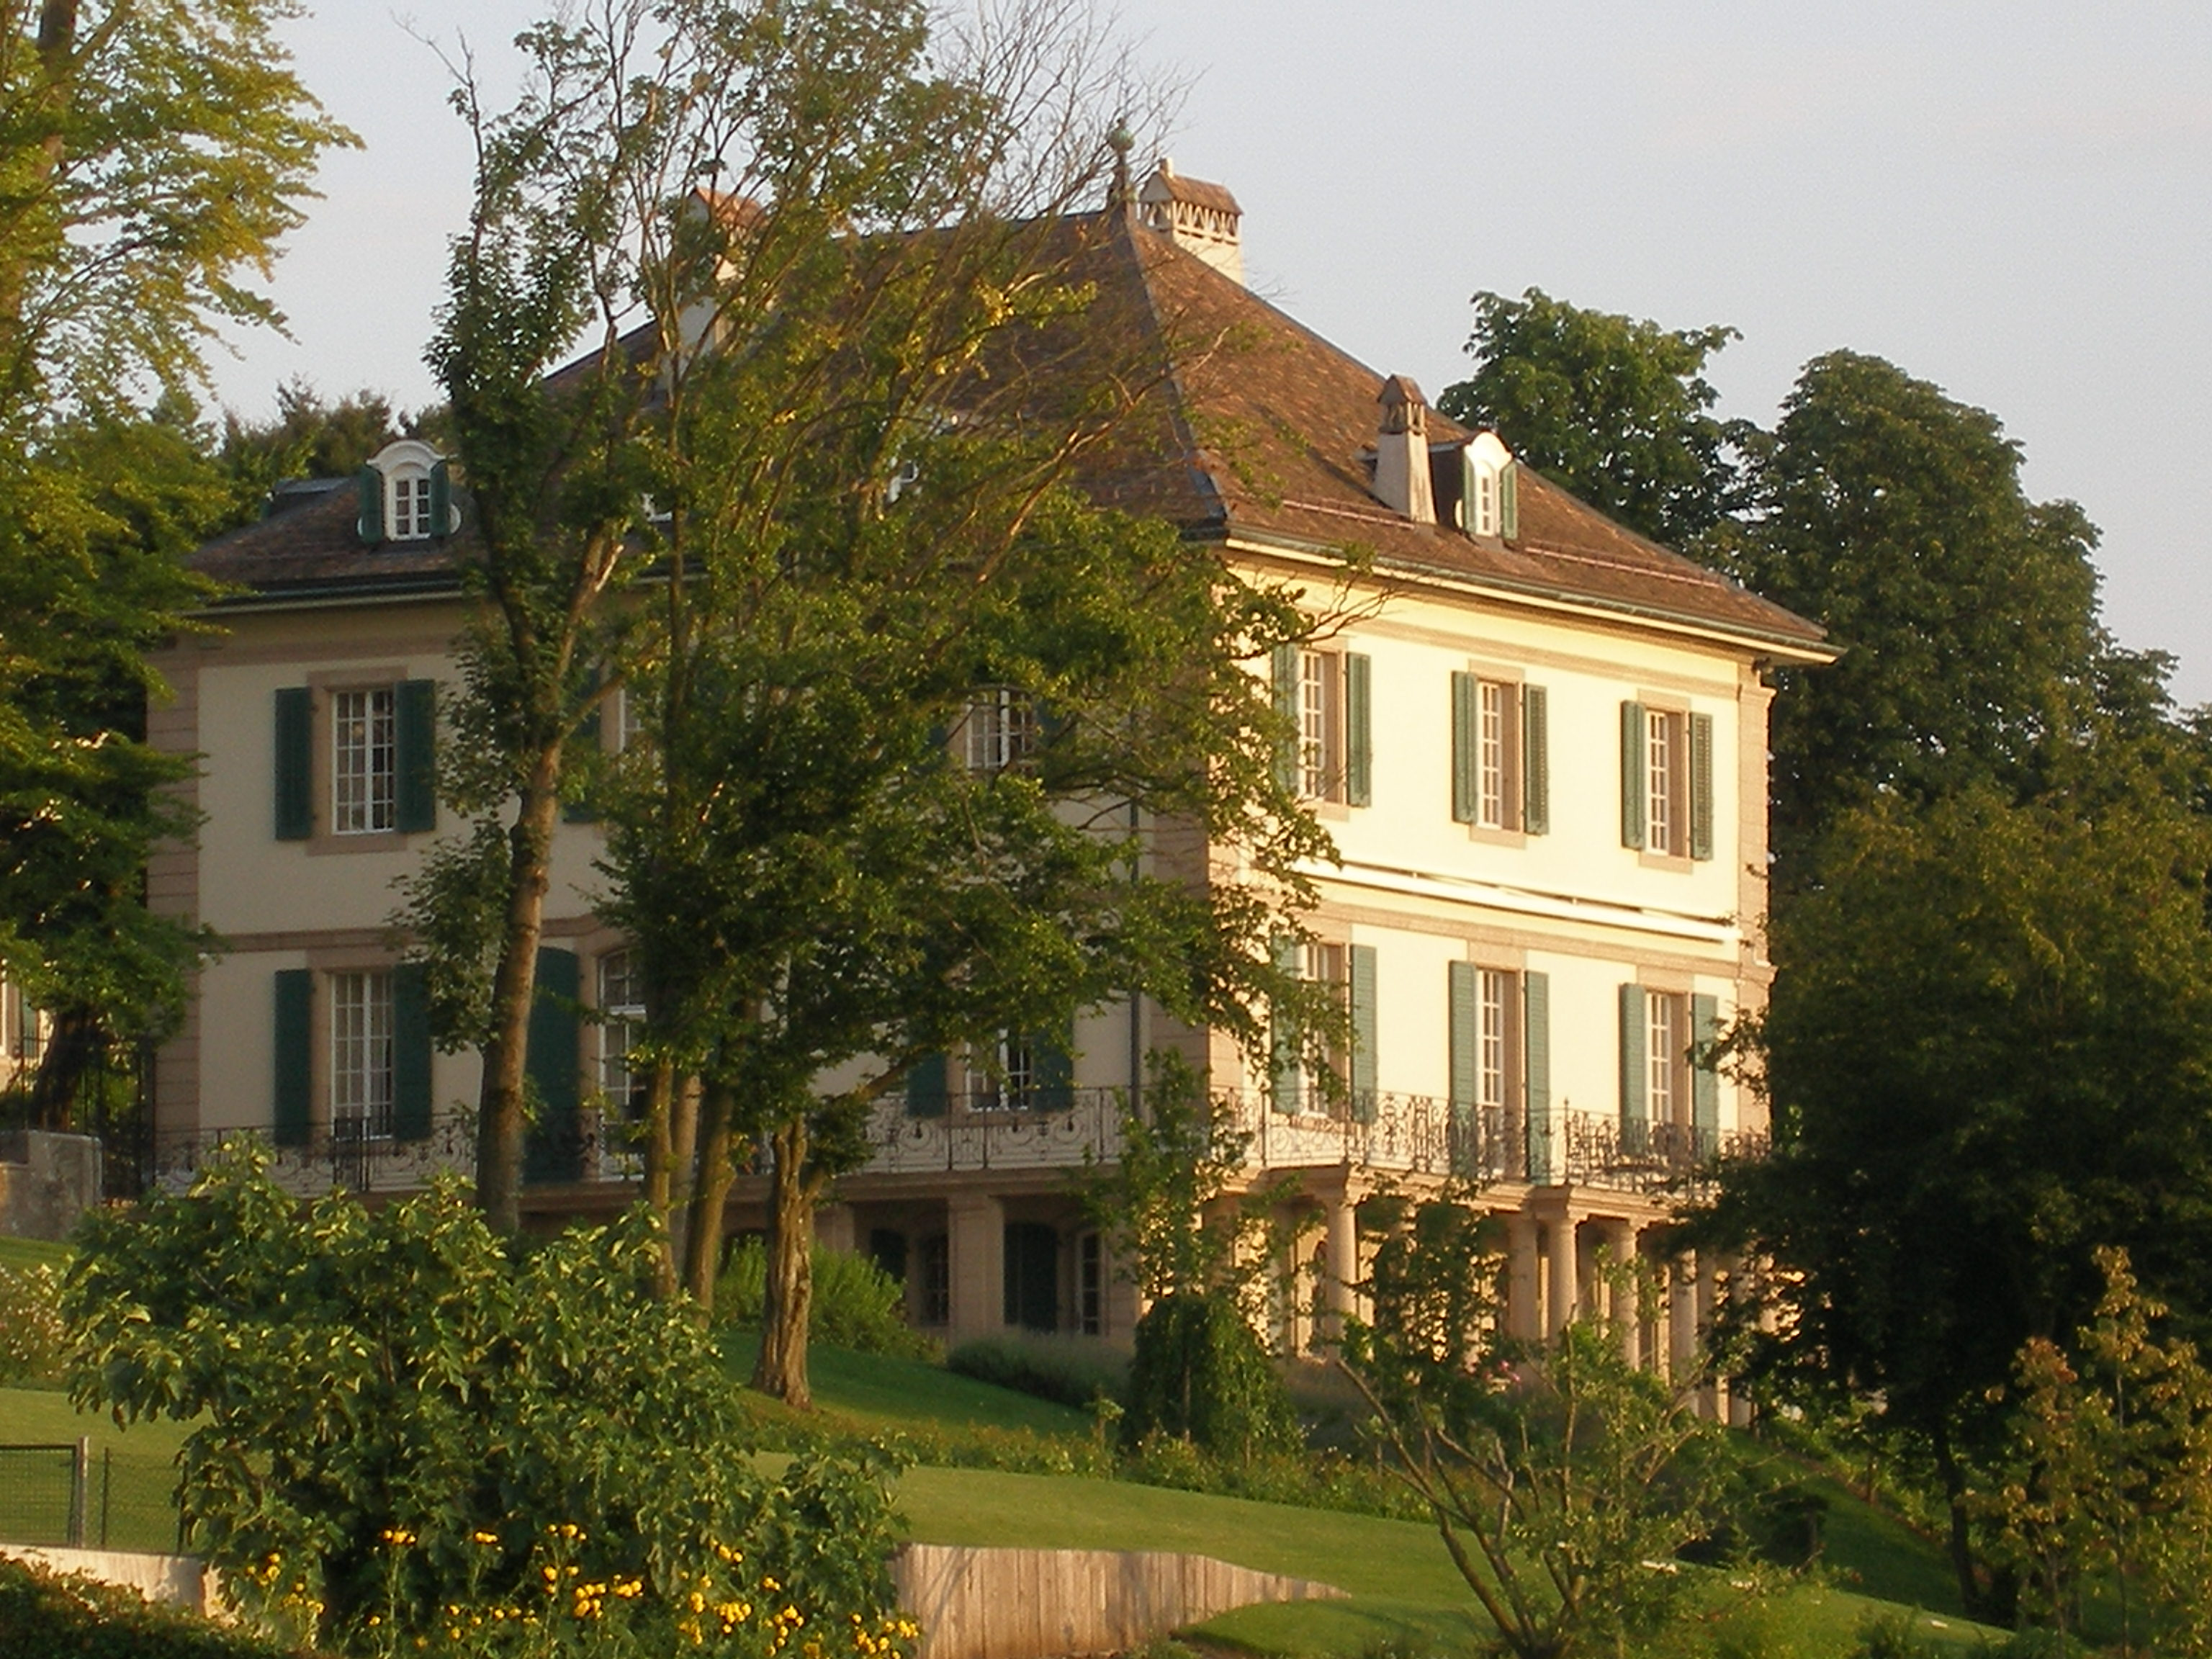 Hotel Villa Honegg Price